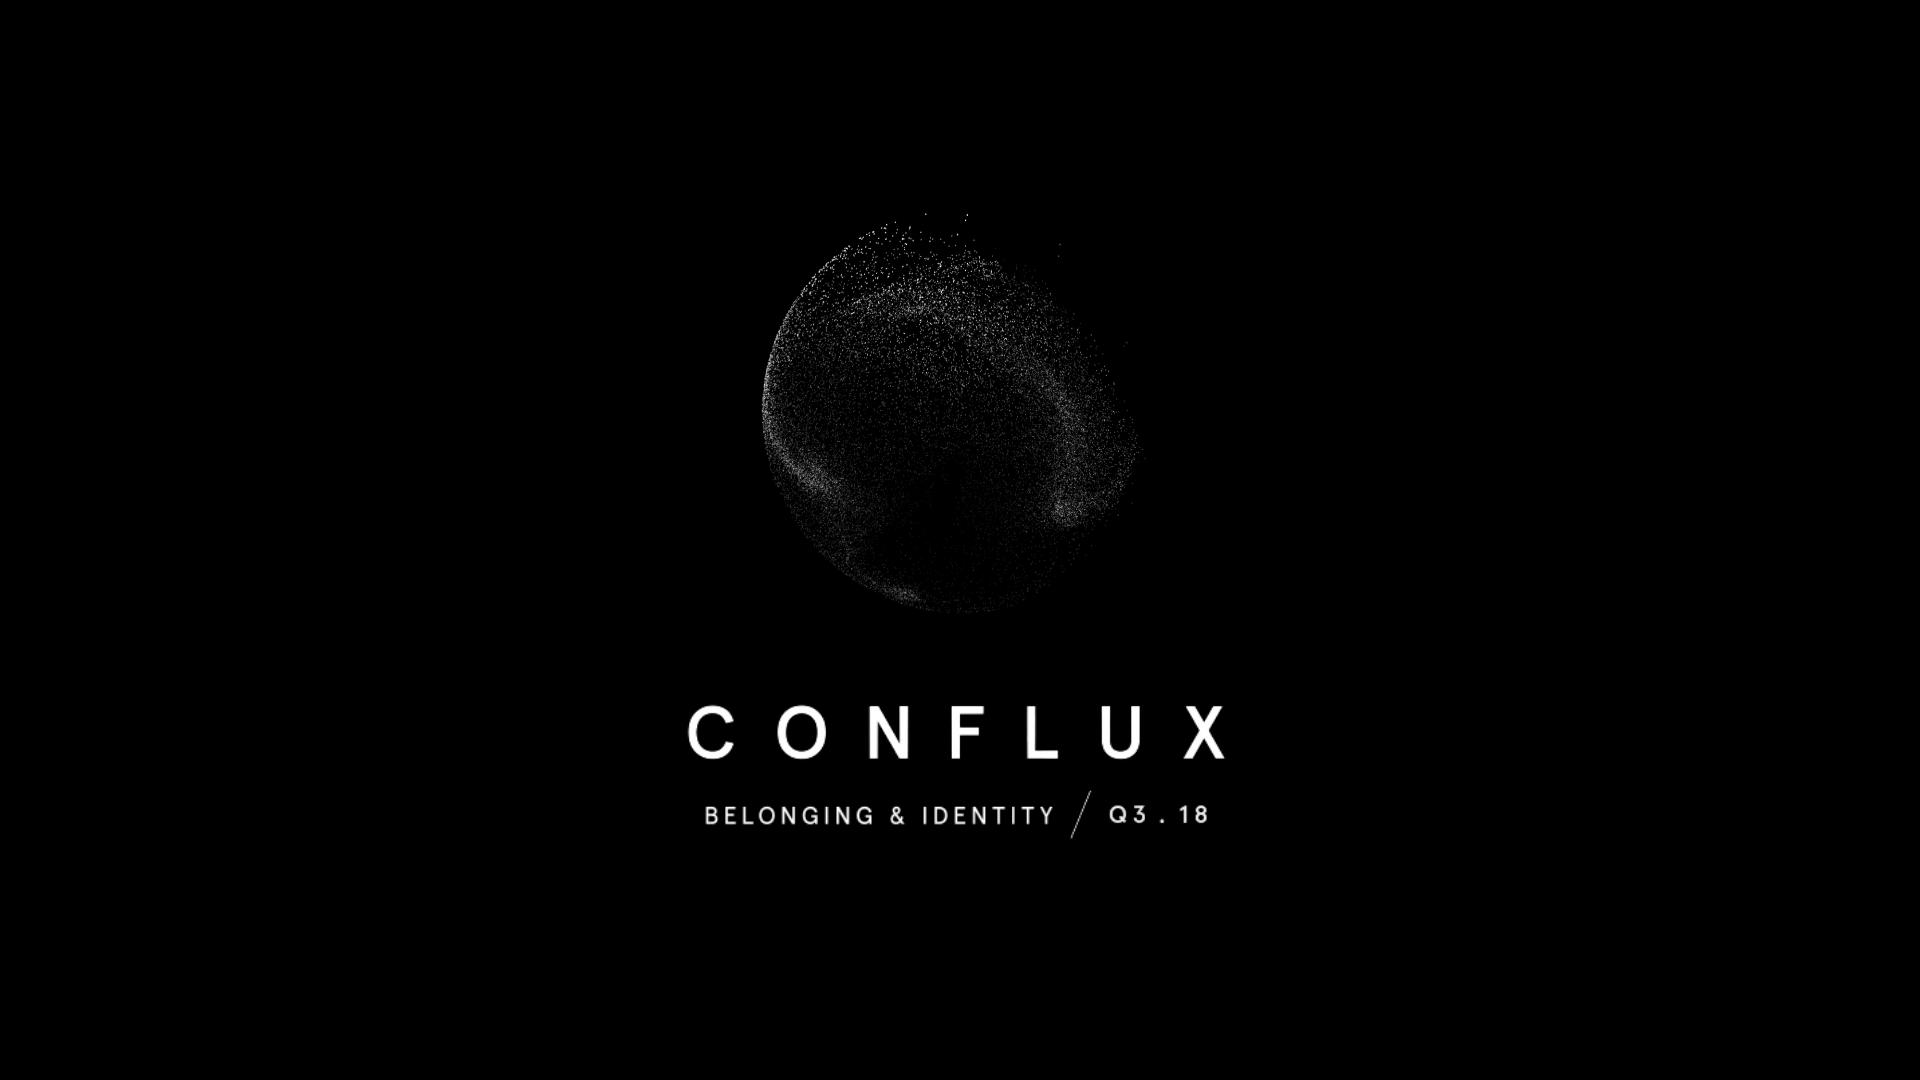 Conflux 2019B.png